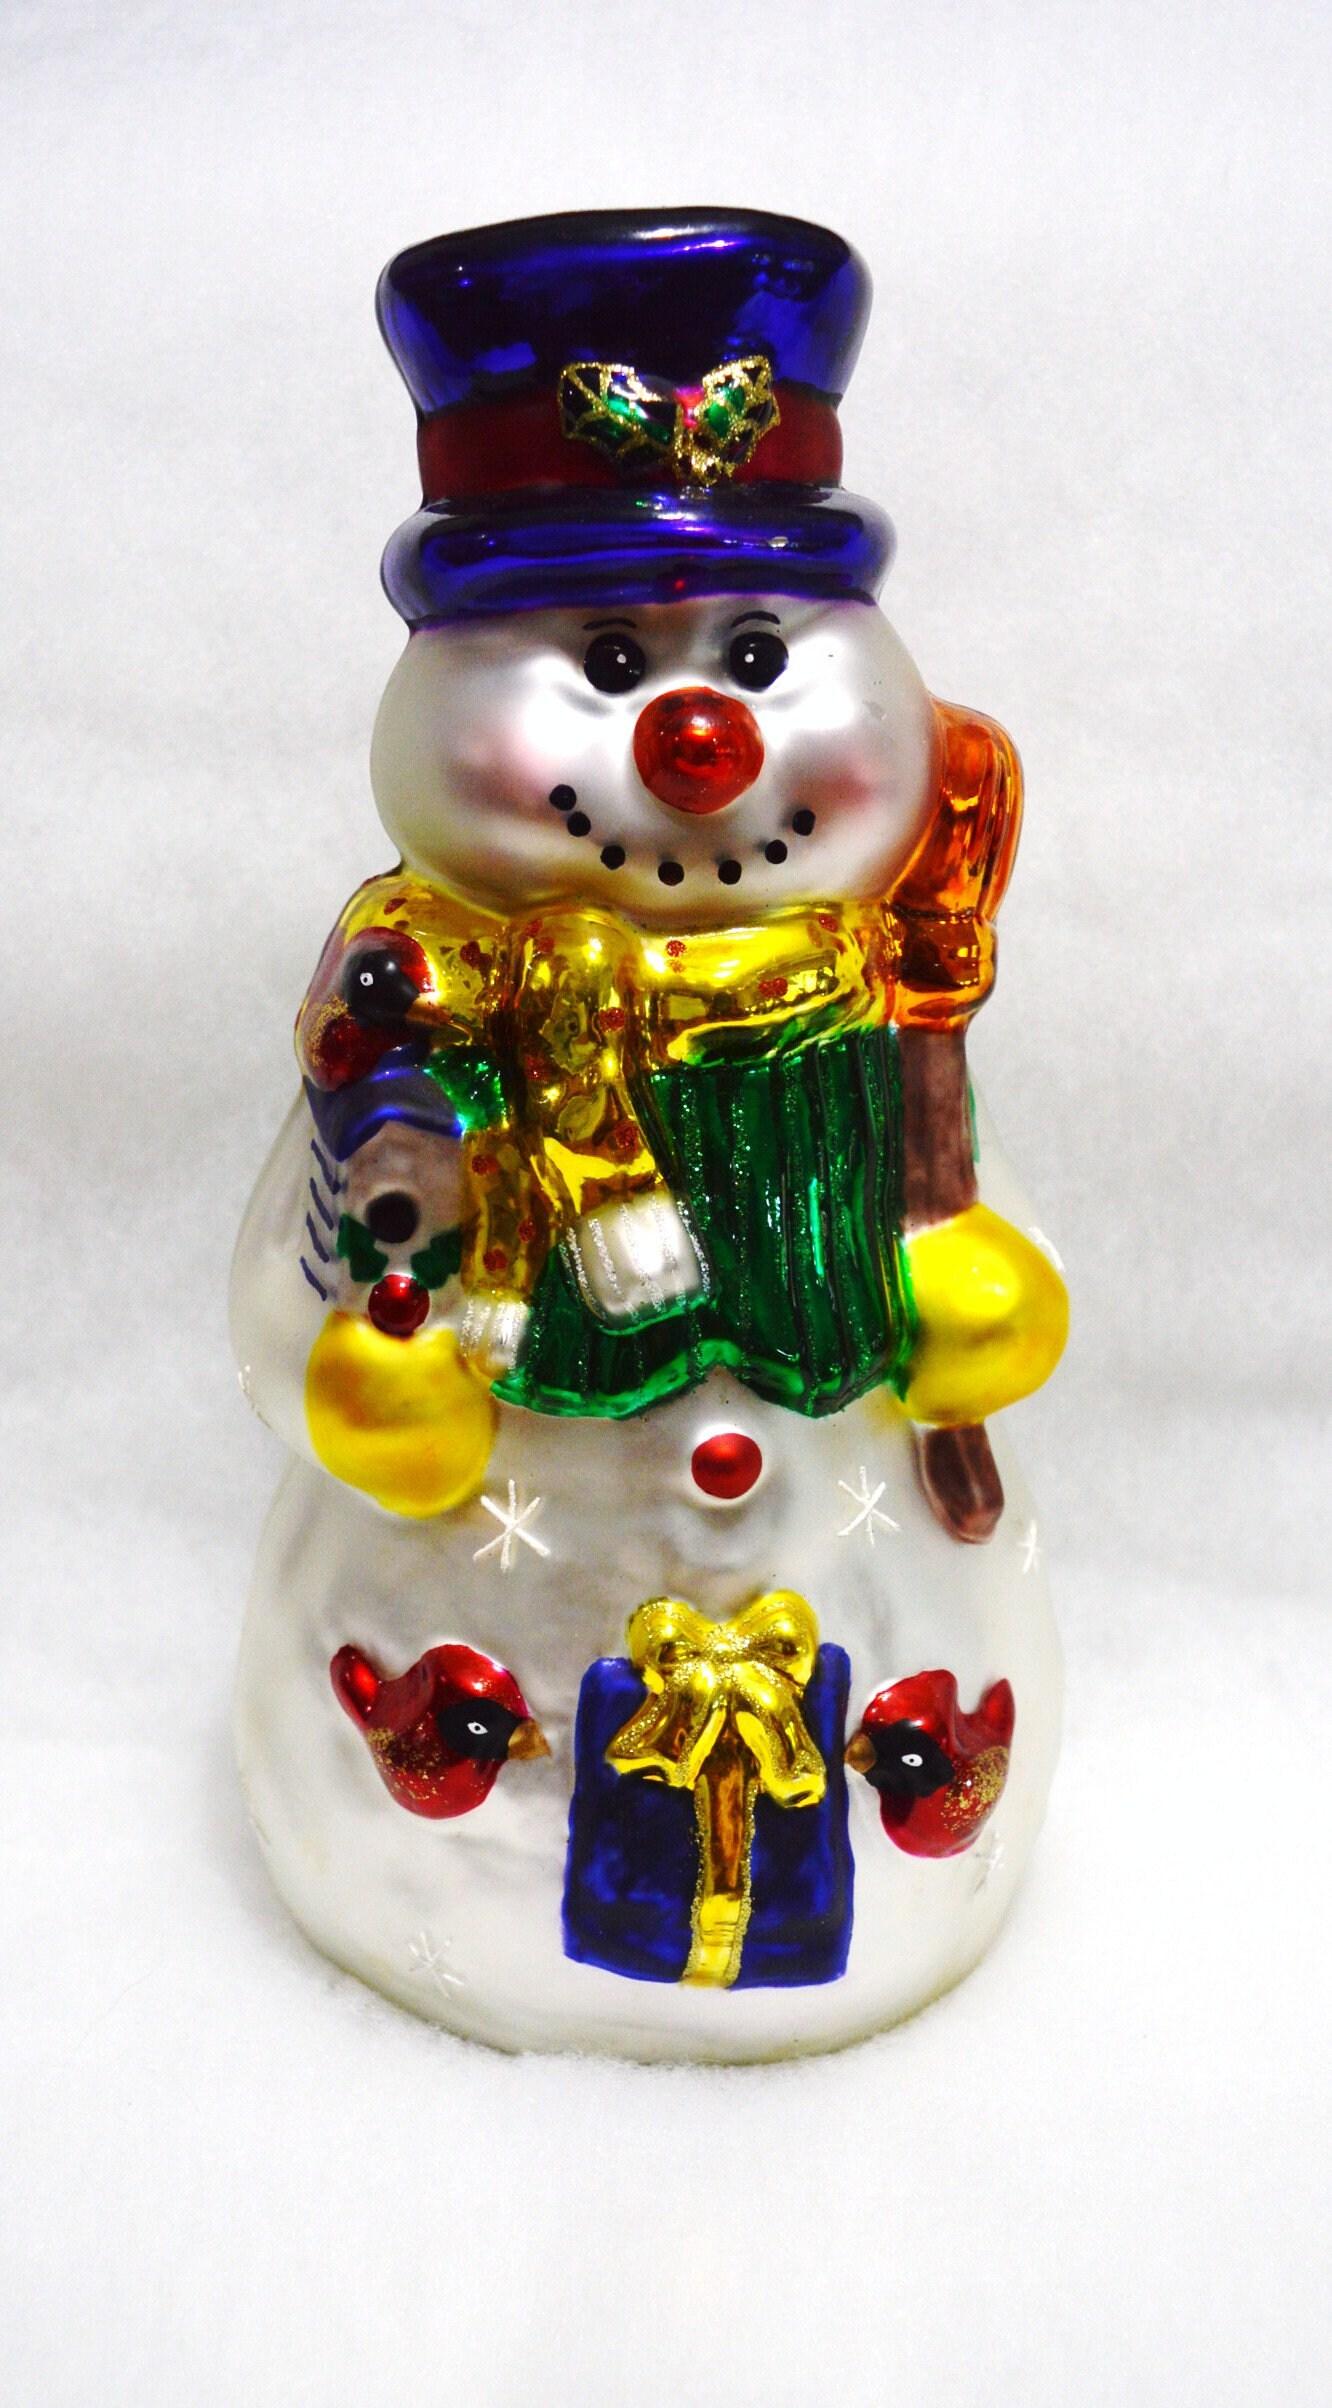 POSTAL SERVICE USPS U.S Hand Painted Glass Santa Ornaments Set of 4 **NEW**